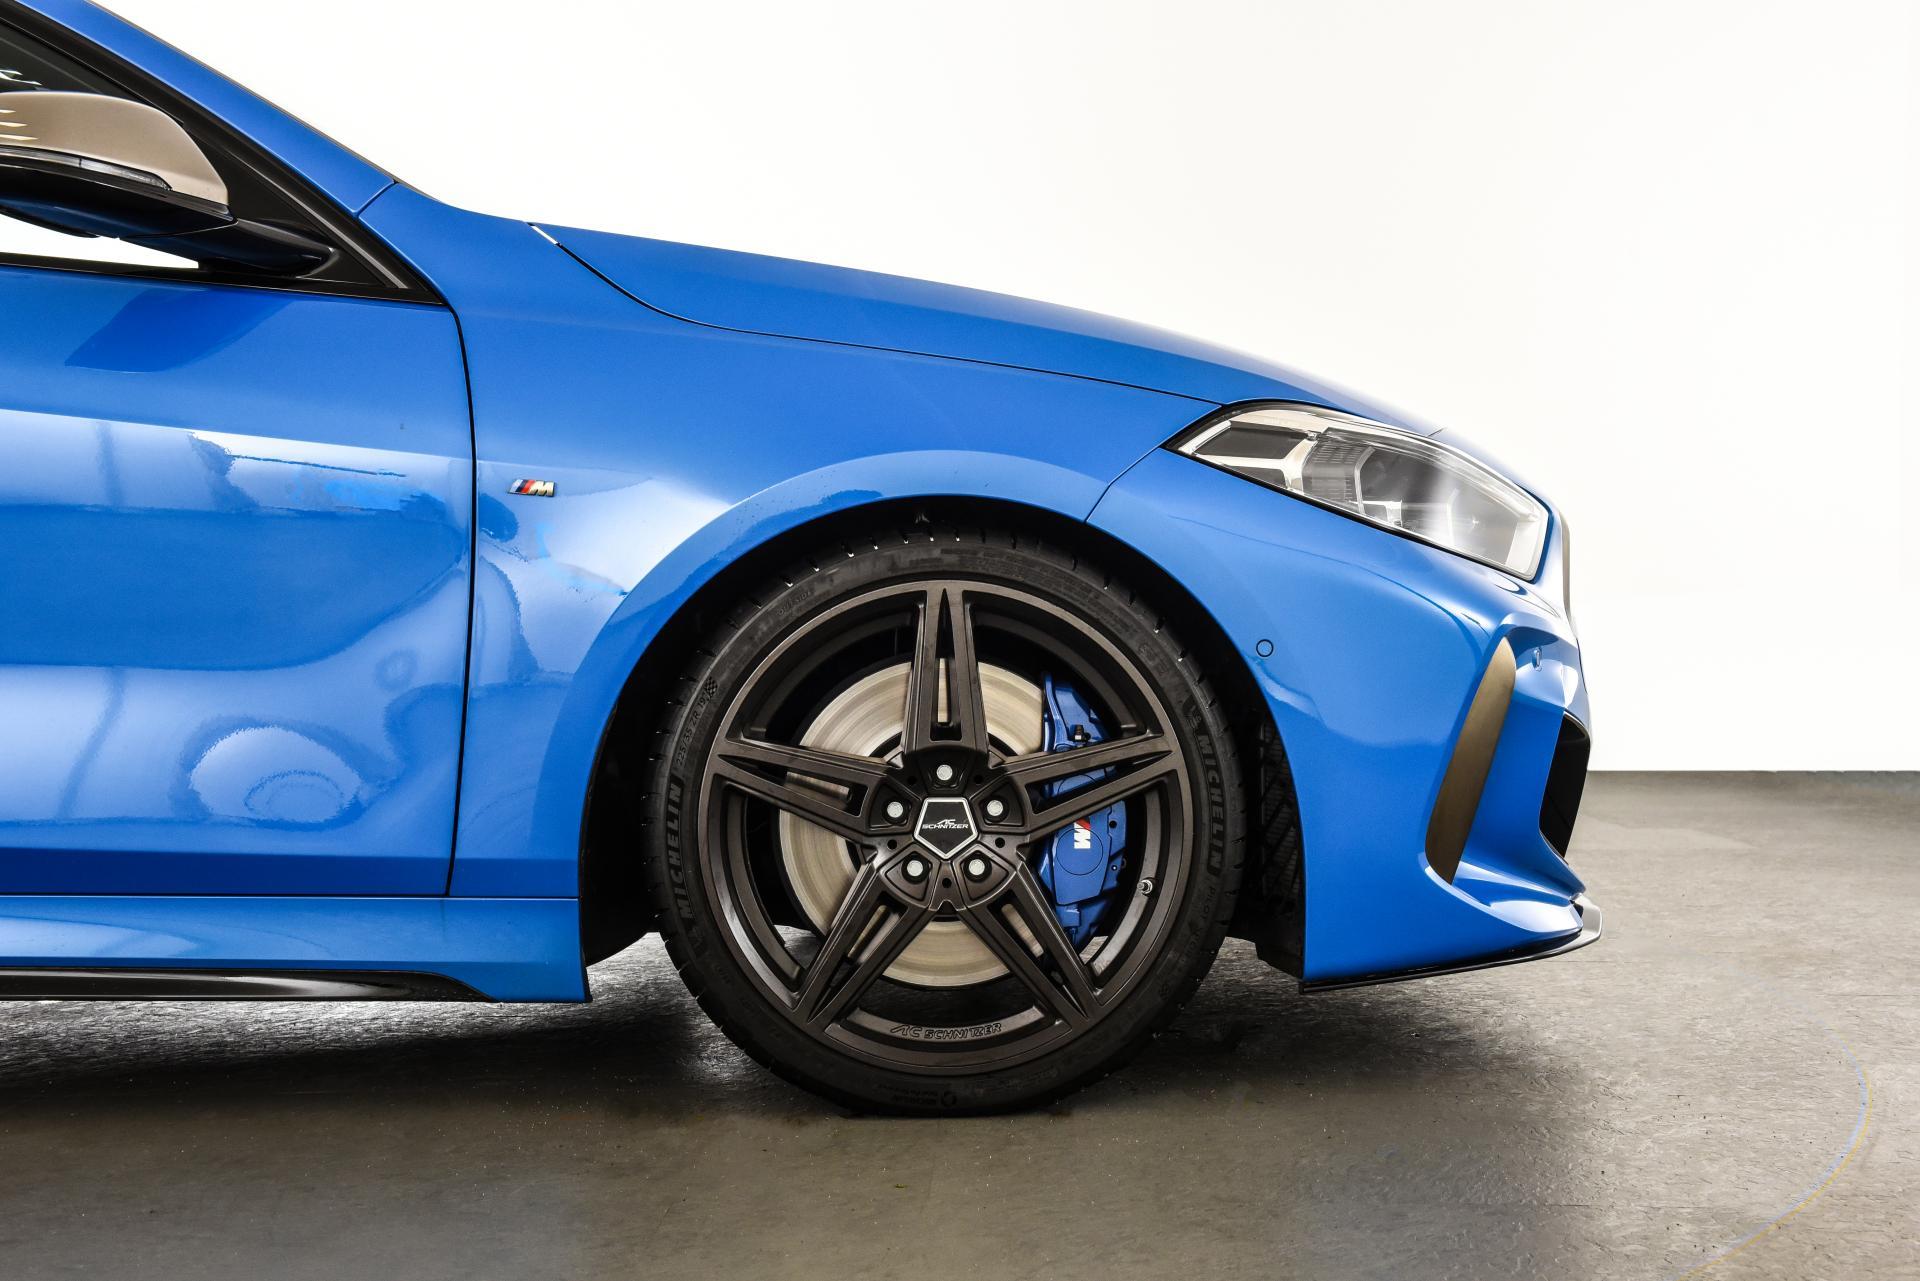 BMW-1-Series-M135i-by-AC-Schnitzer-3